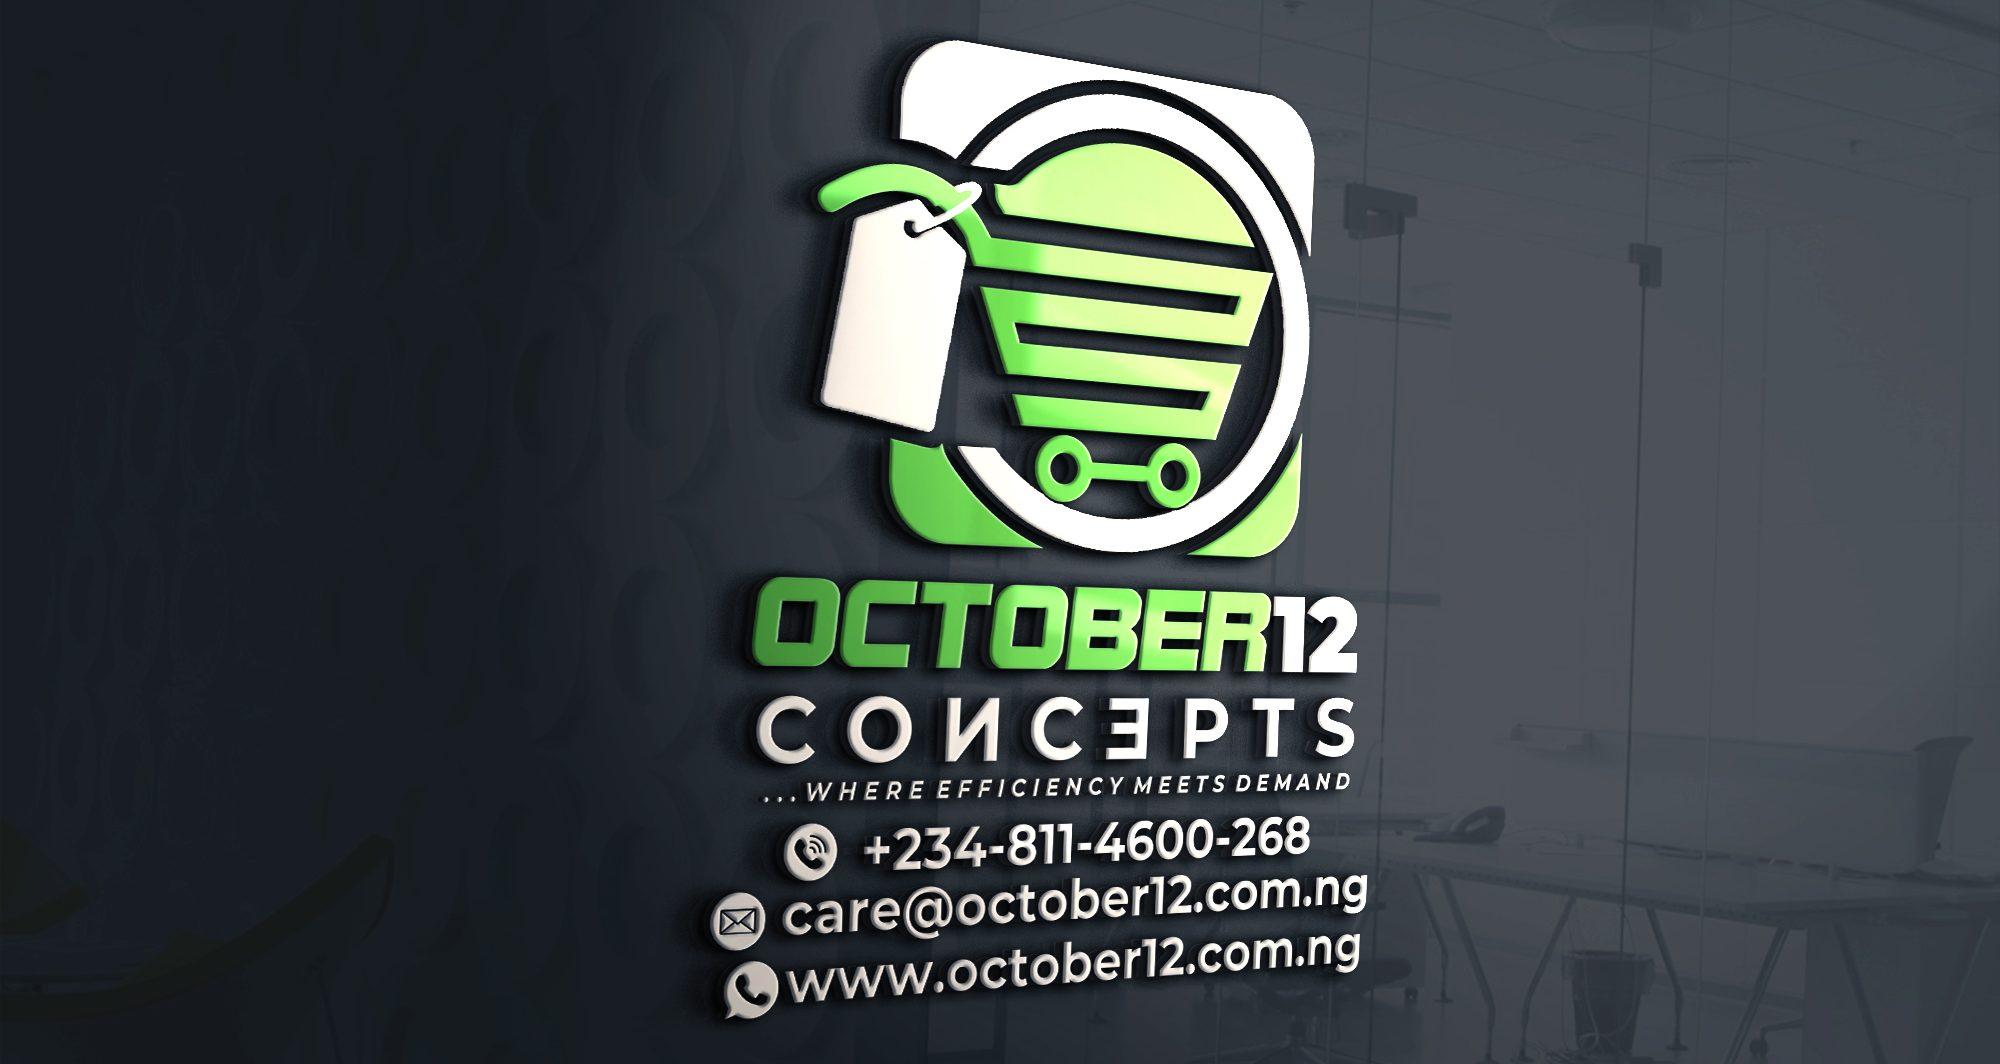 October 12 Concepts